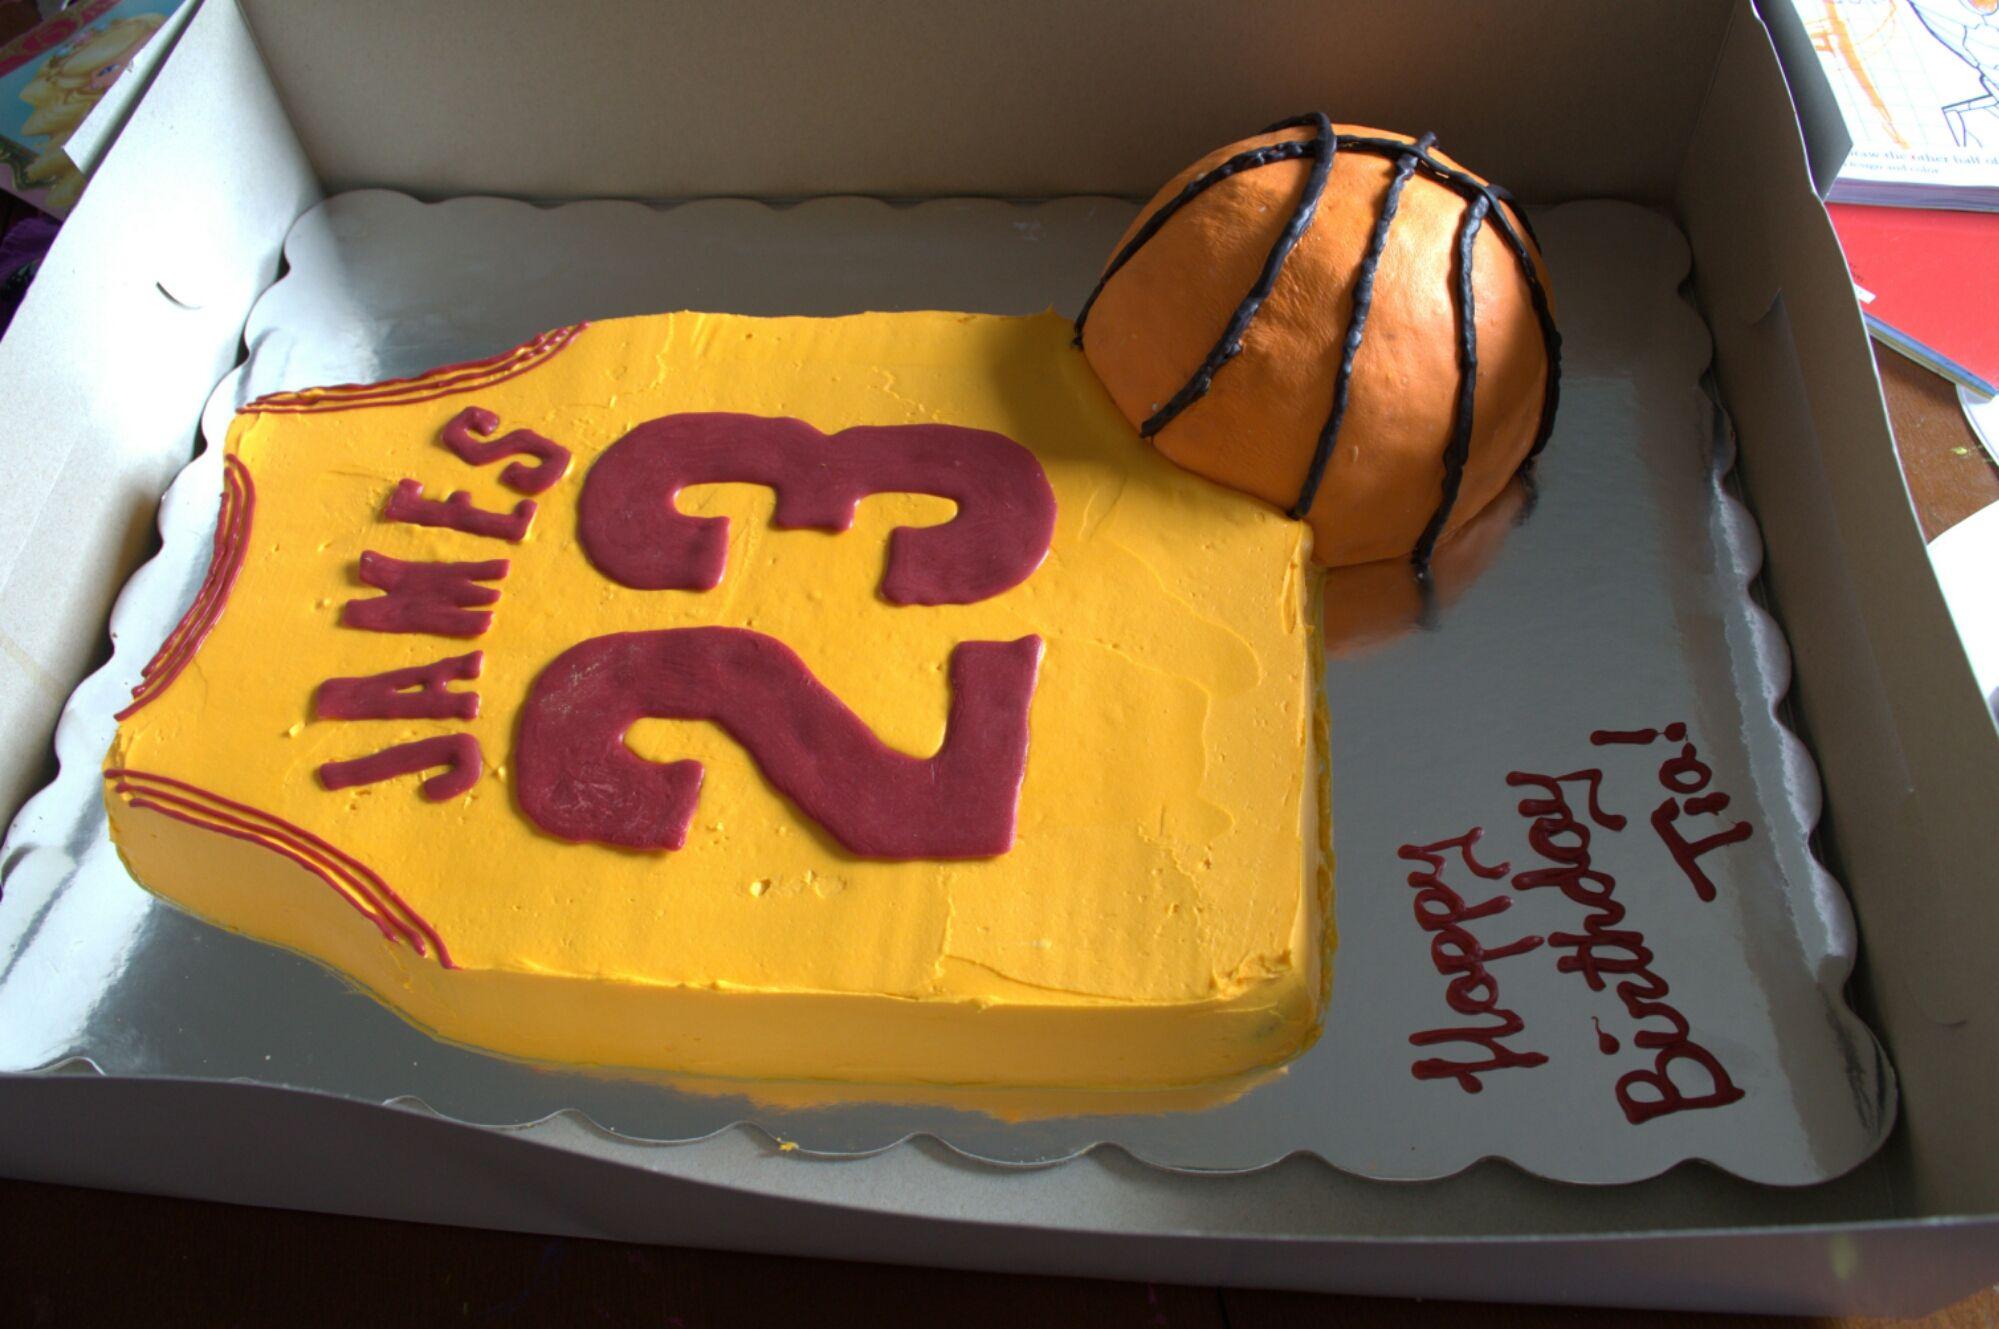 Lebron James Cavaliers Jersey Cake Half Chocolate Half Vanilla